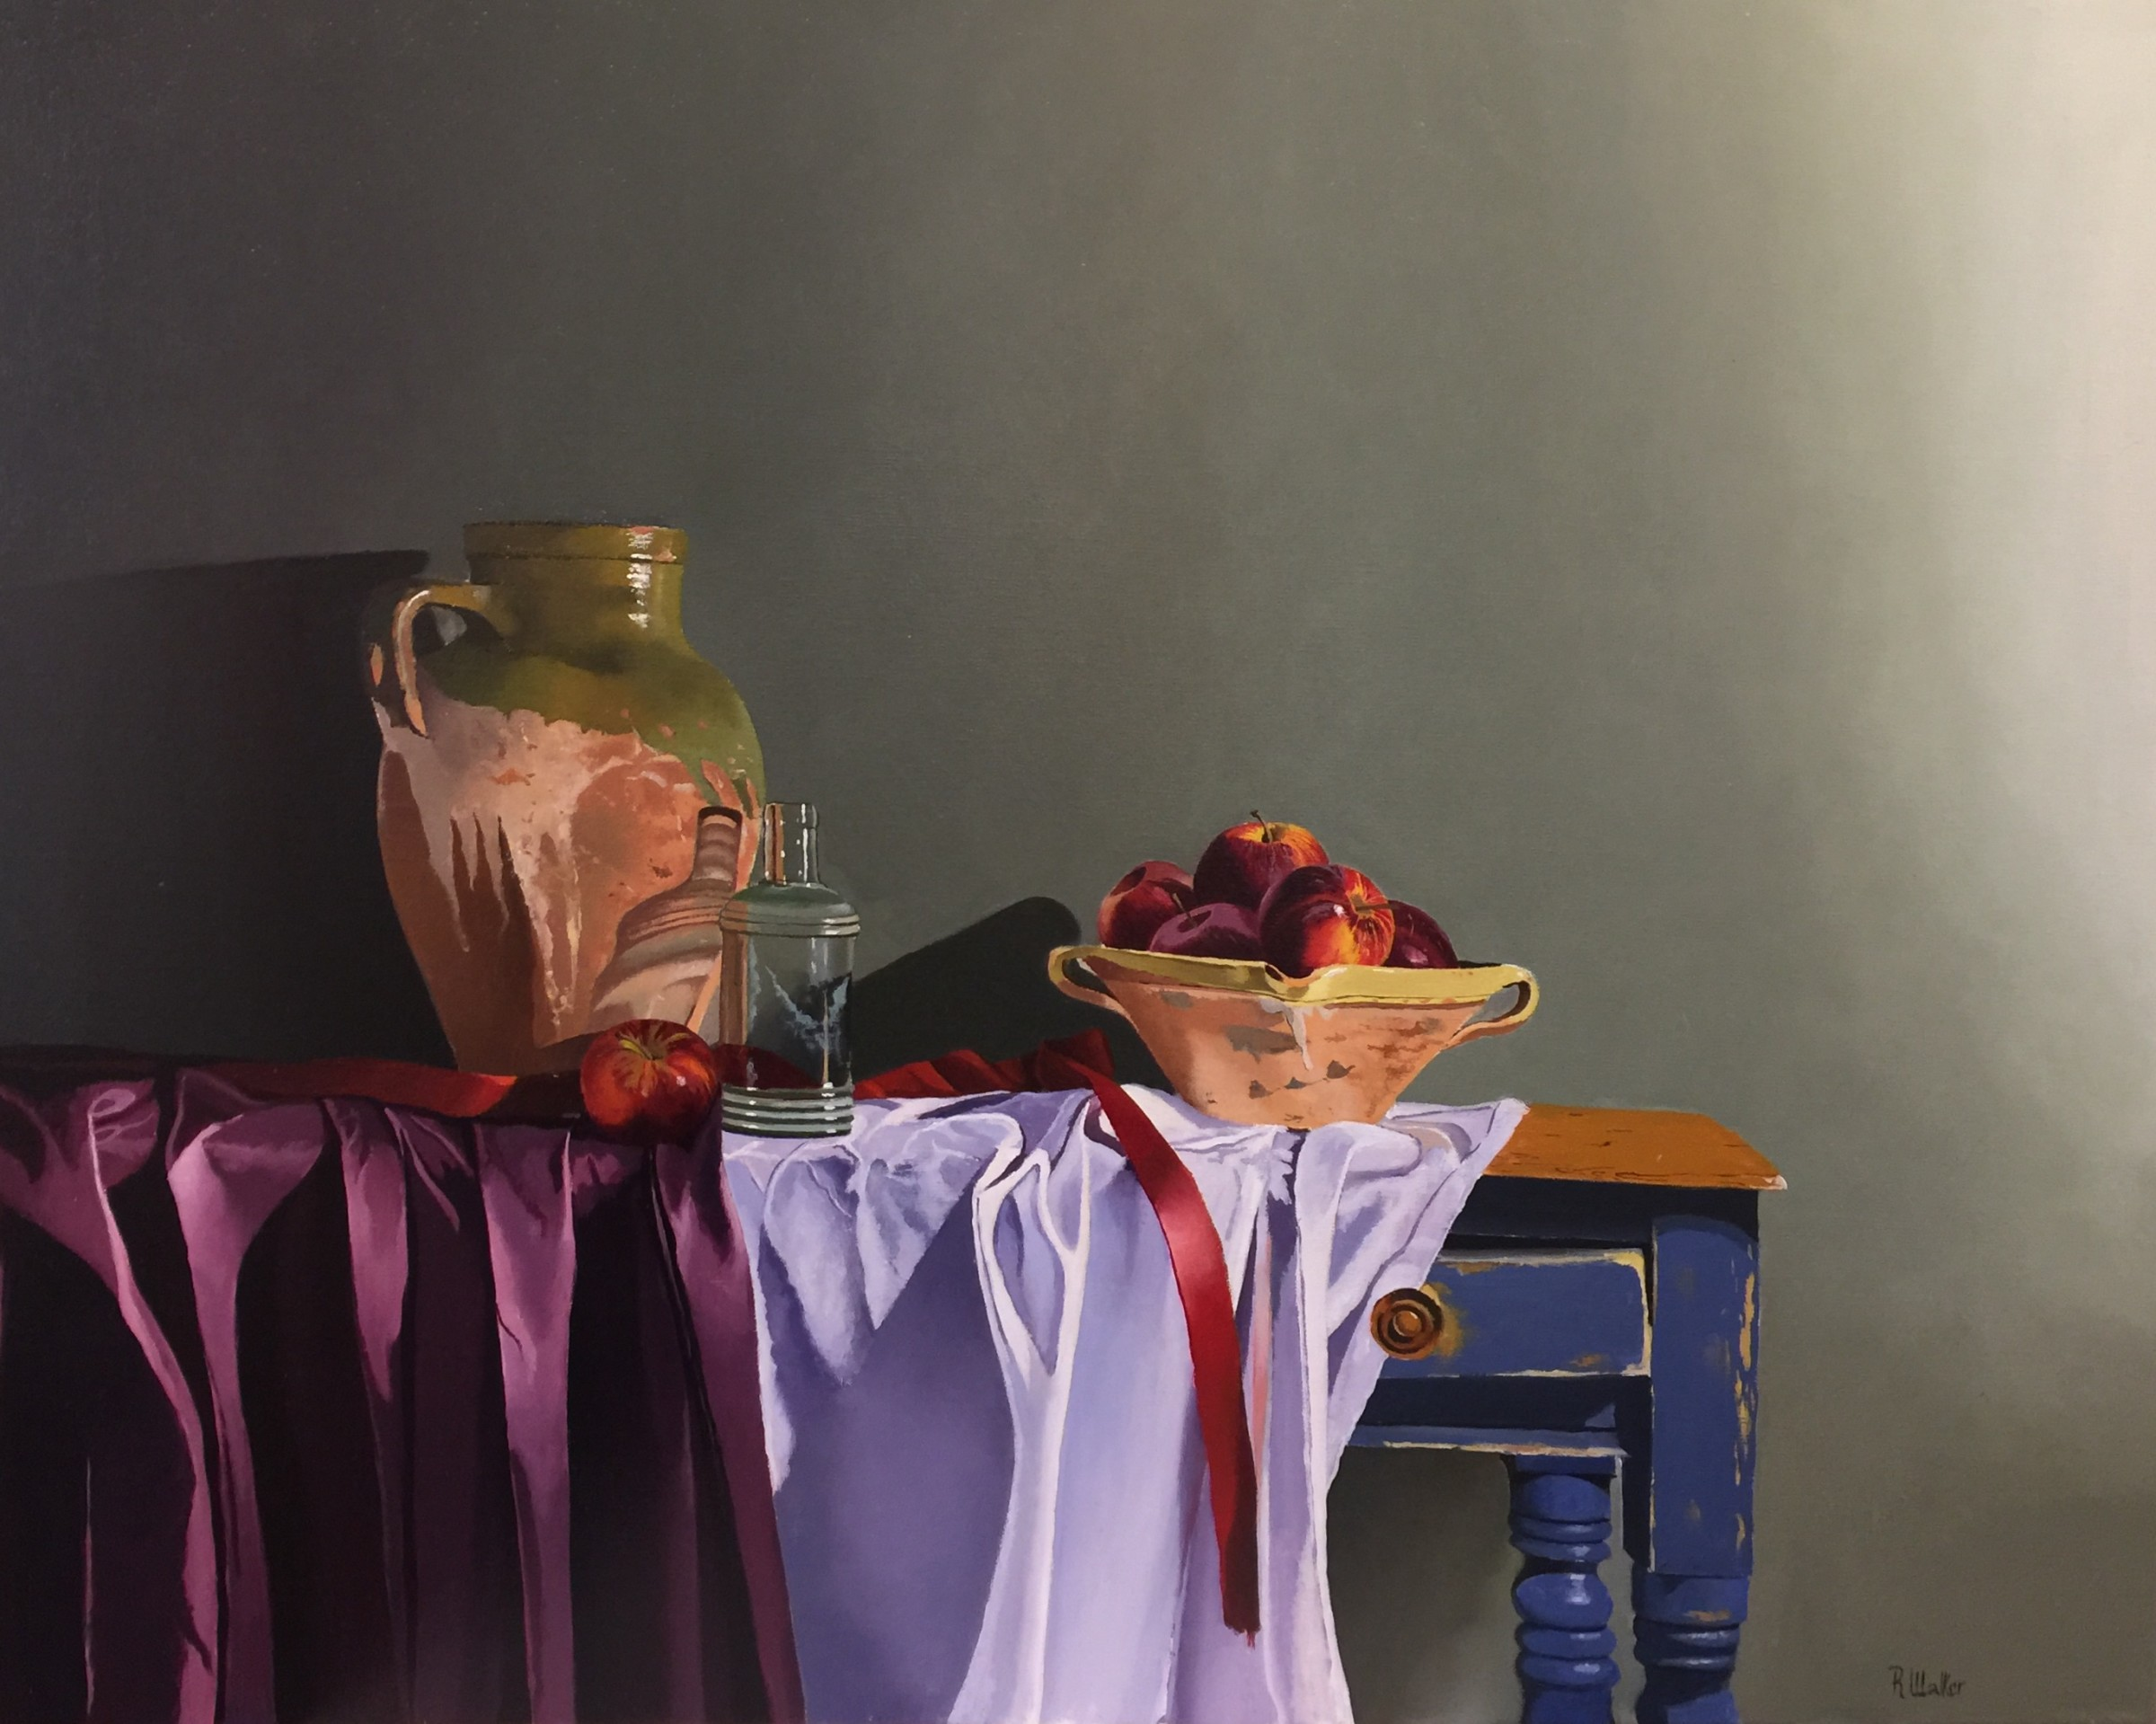 <span class=&#34;link fancybox-details-link&#34;><a href=&#34;/artists/67-robert-walker/works/1951-robert-walker-red-ribbon-and-apple-bowl-in-hong-kong/&#34;>View Detail Page</a></span><div class=&#34;artist&#34;><strong>Robert Walker</strong></div> <div class=&#34;title&#34;><em>Red Ribbon and Apple Bowl</em>, In Hong Kong</div> <div class=&#34;medium&#34;>Oil on Linen </div> <div class=&#34;dimensions&#34;>64 x 79 cm</div><div class=&#34;copyright_line&#34;>Copyright The Artist</div>